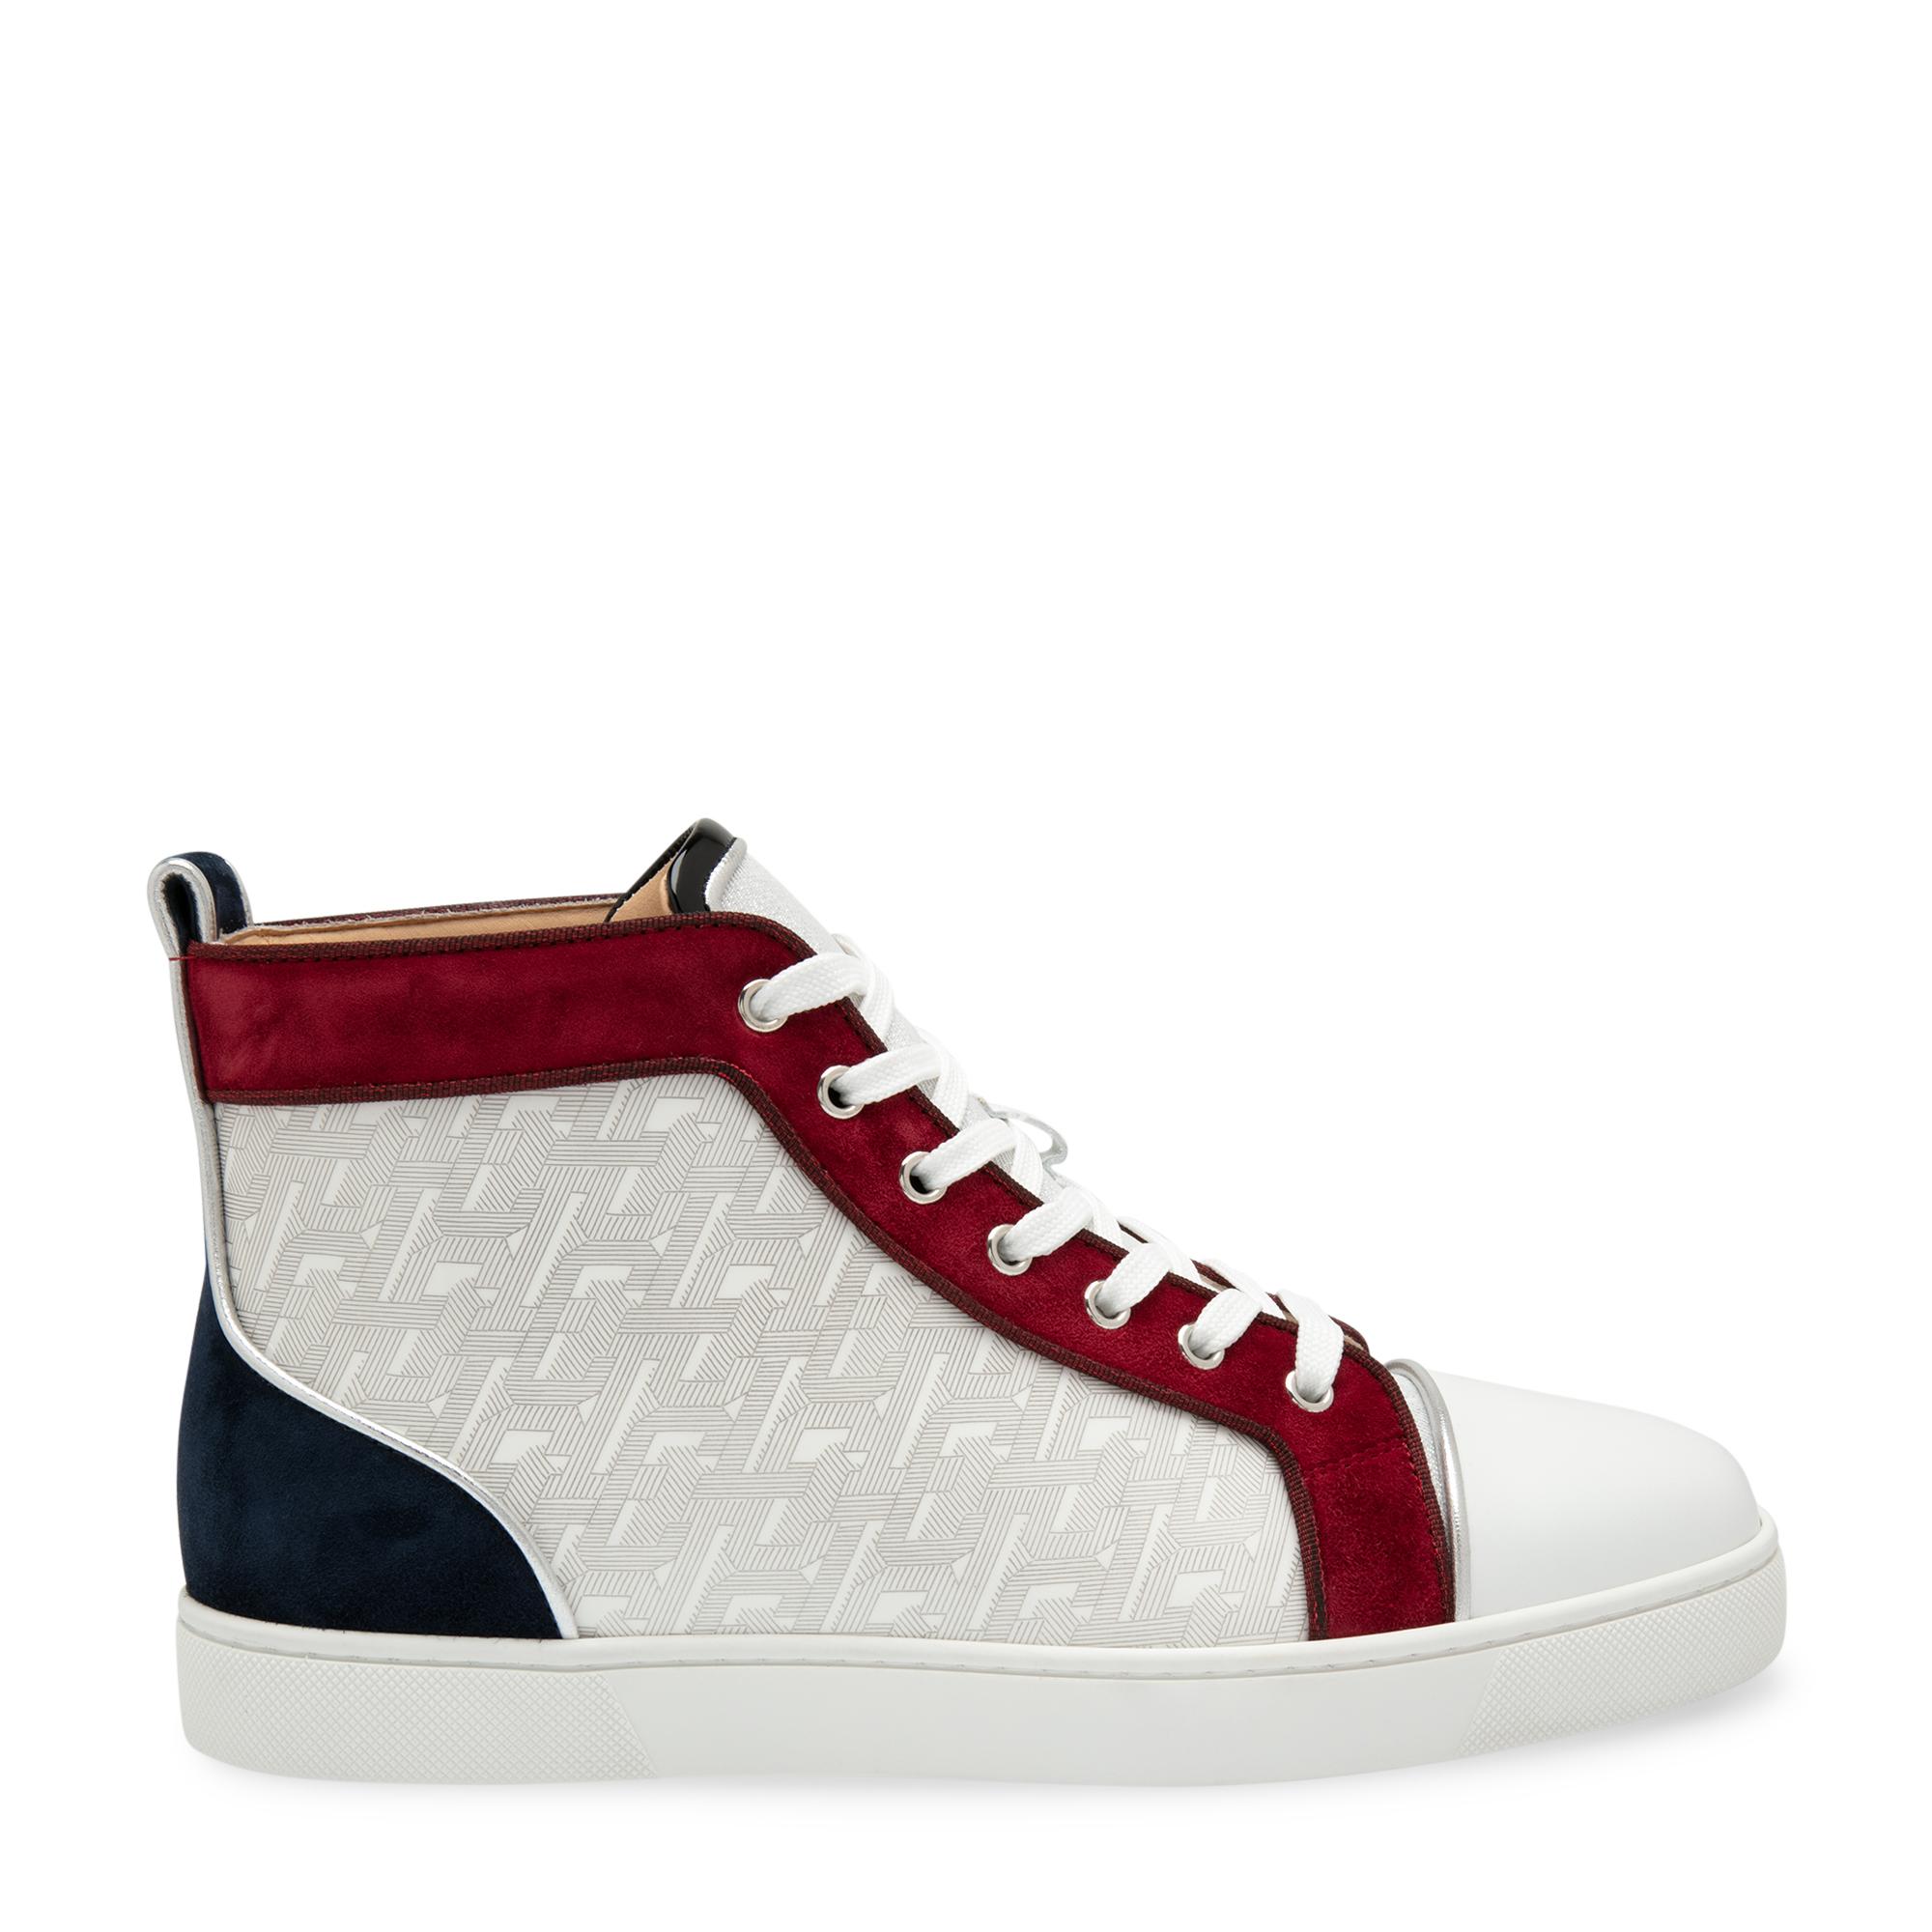 Louis Orlato high-top sneakers